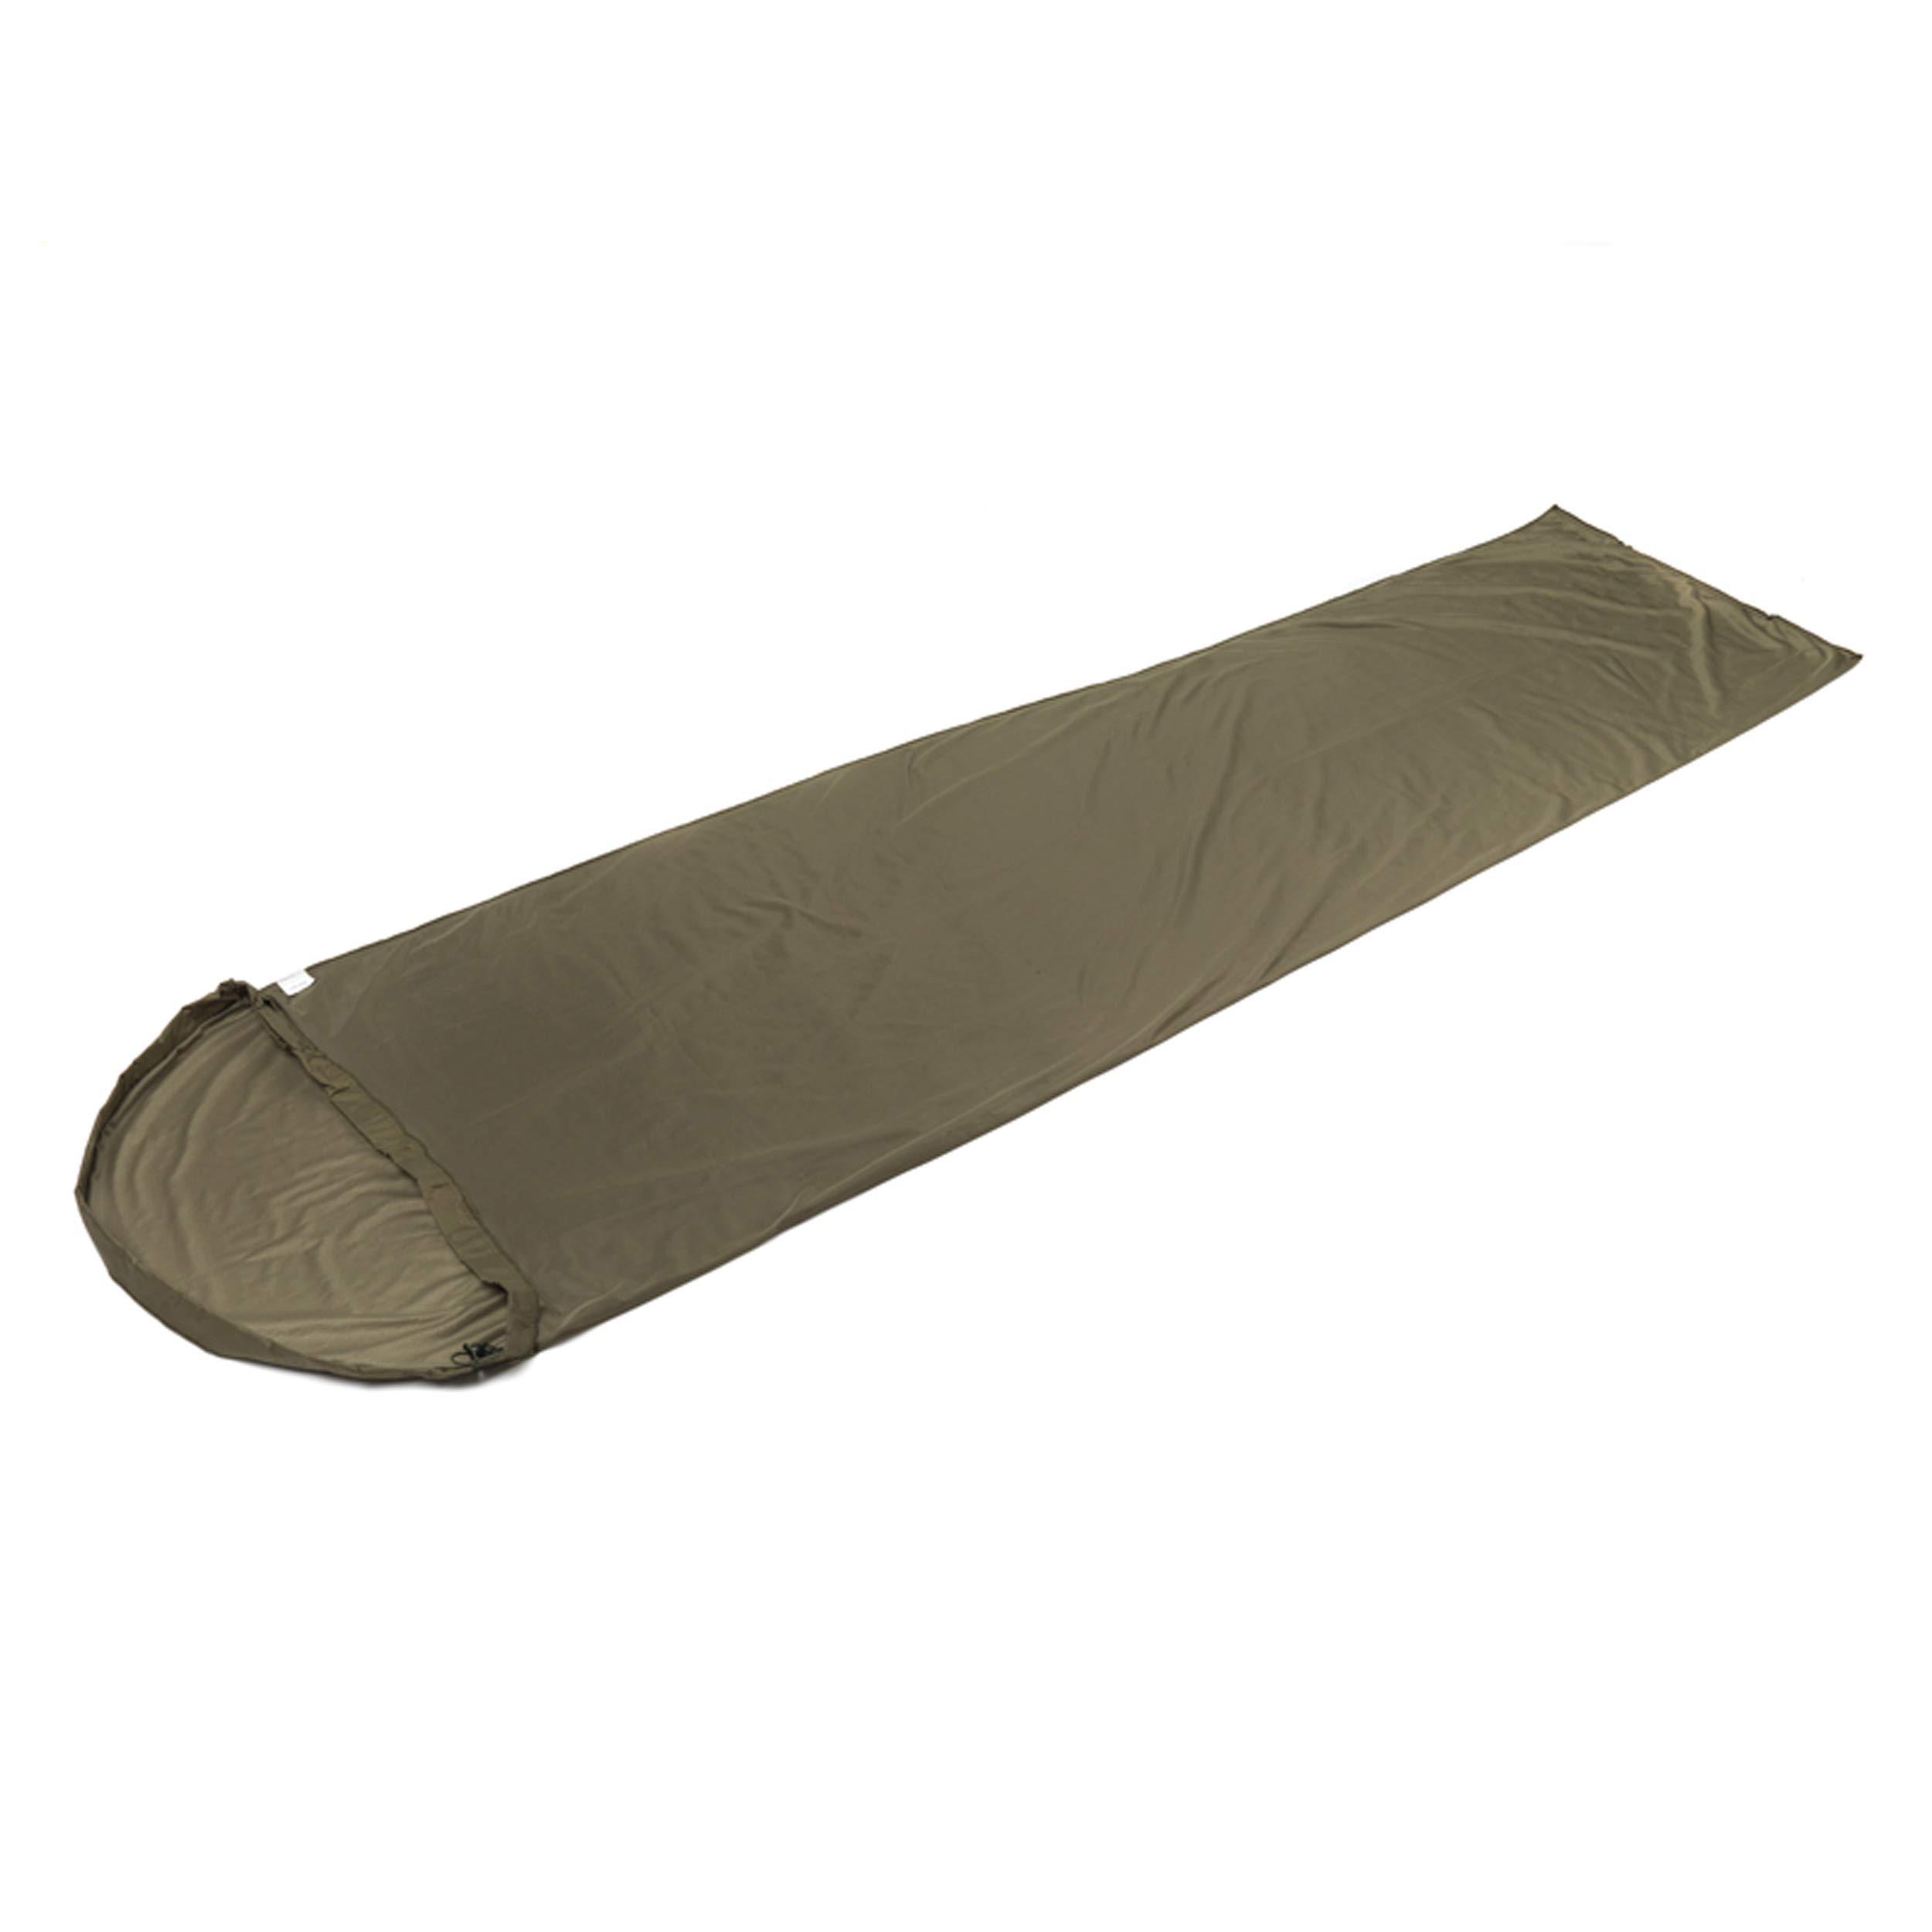 Snugpak TS1 Thermal Suede Sleeping Bag Liner, Polyester, Warm Insulation, Olive by Snugpak